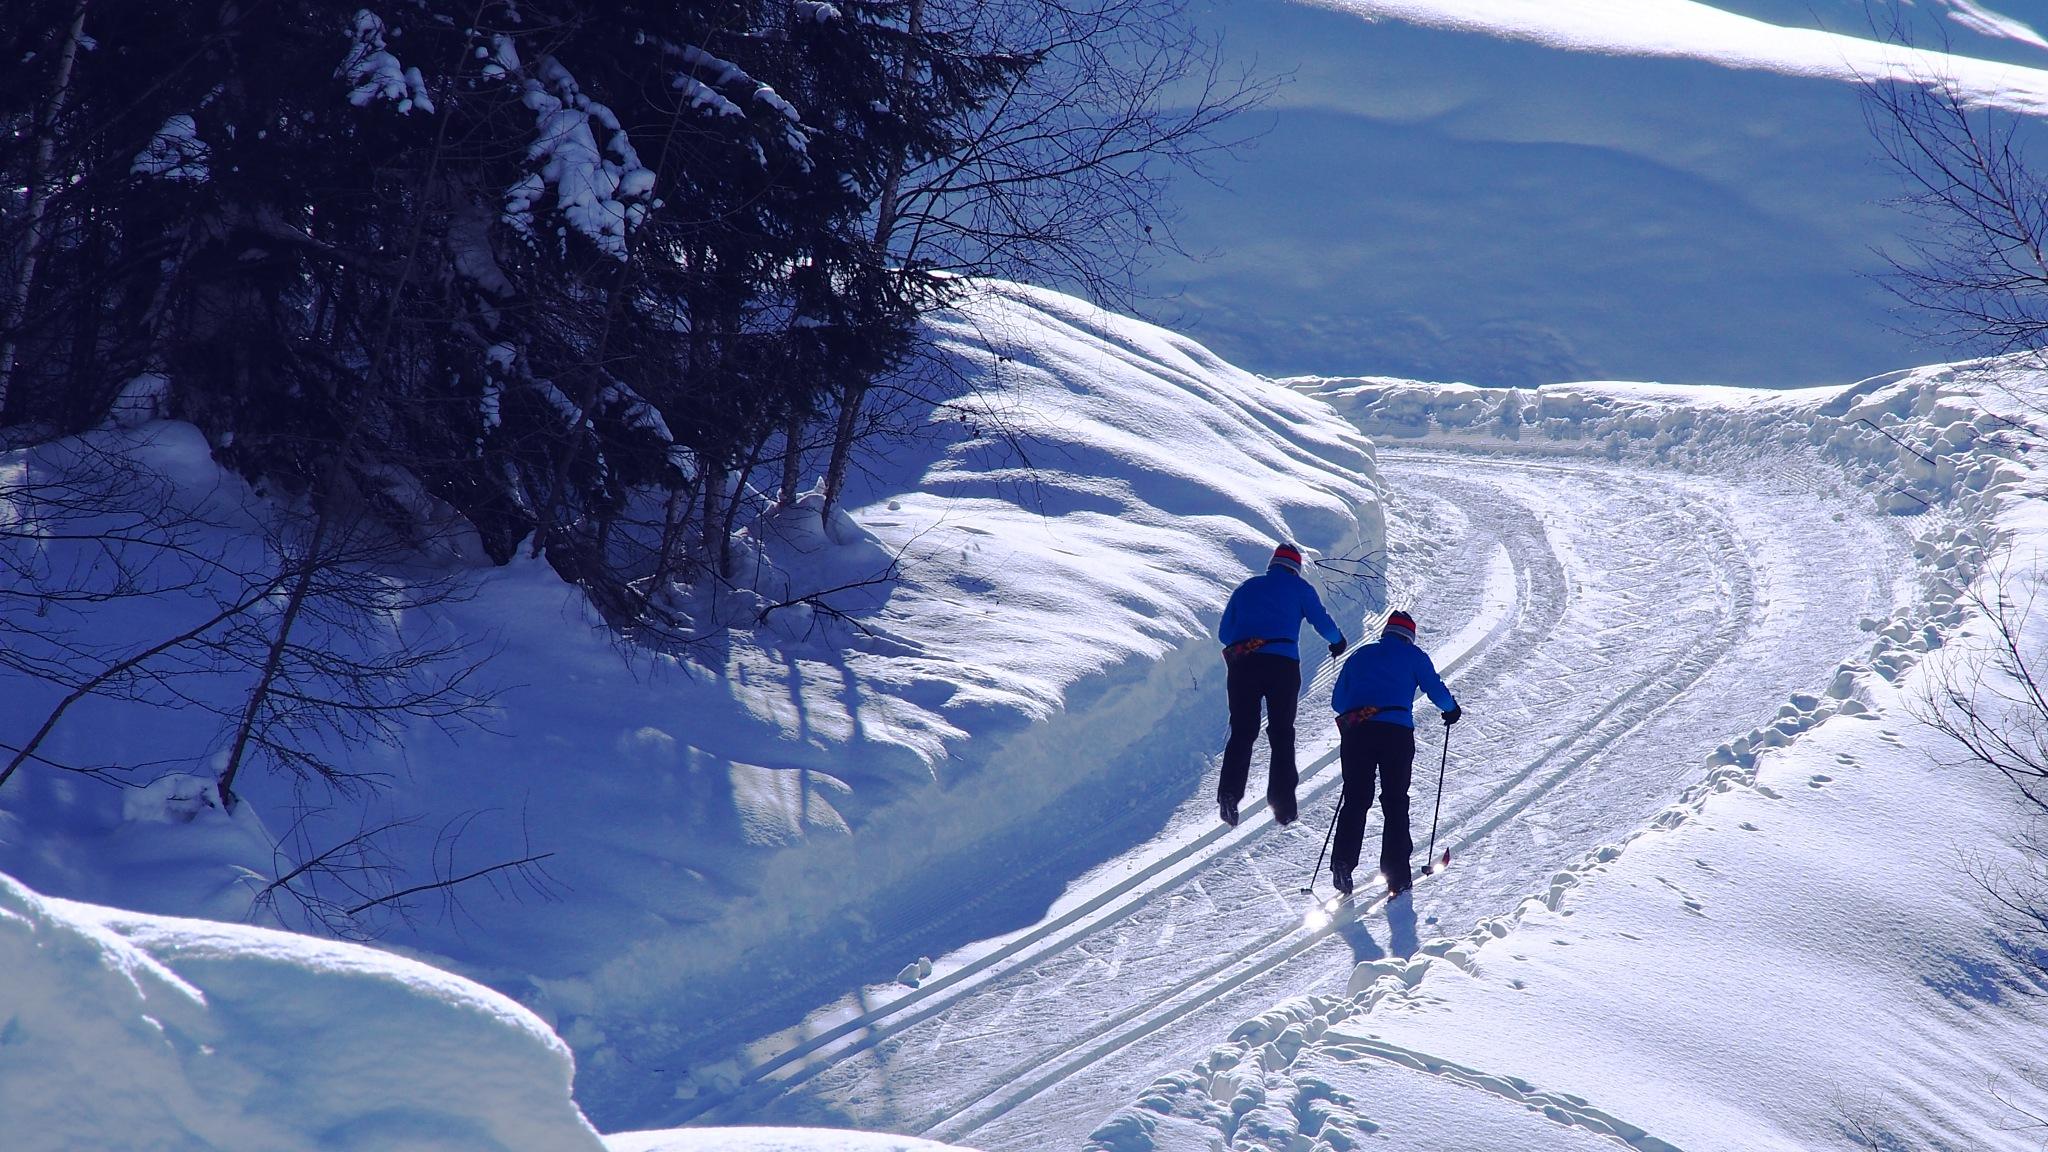 Winter sports by Florian B